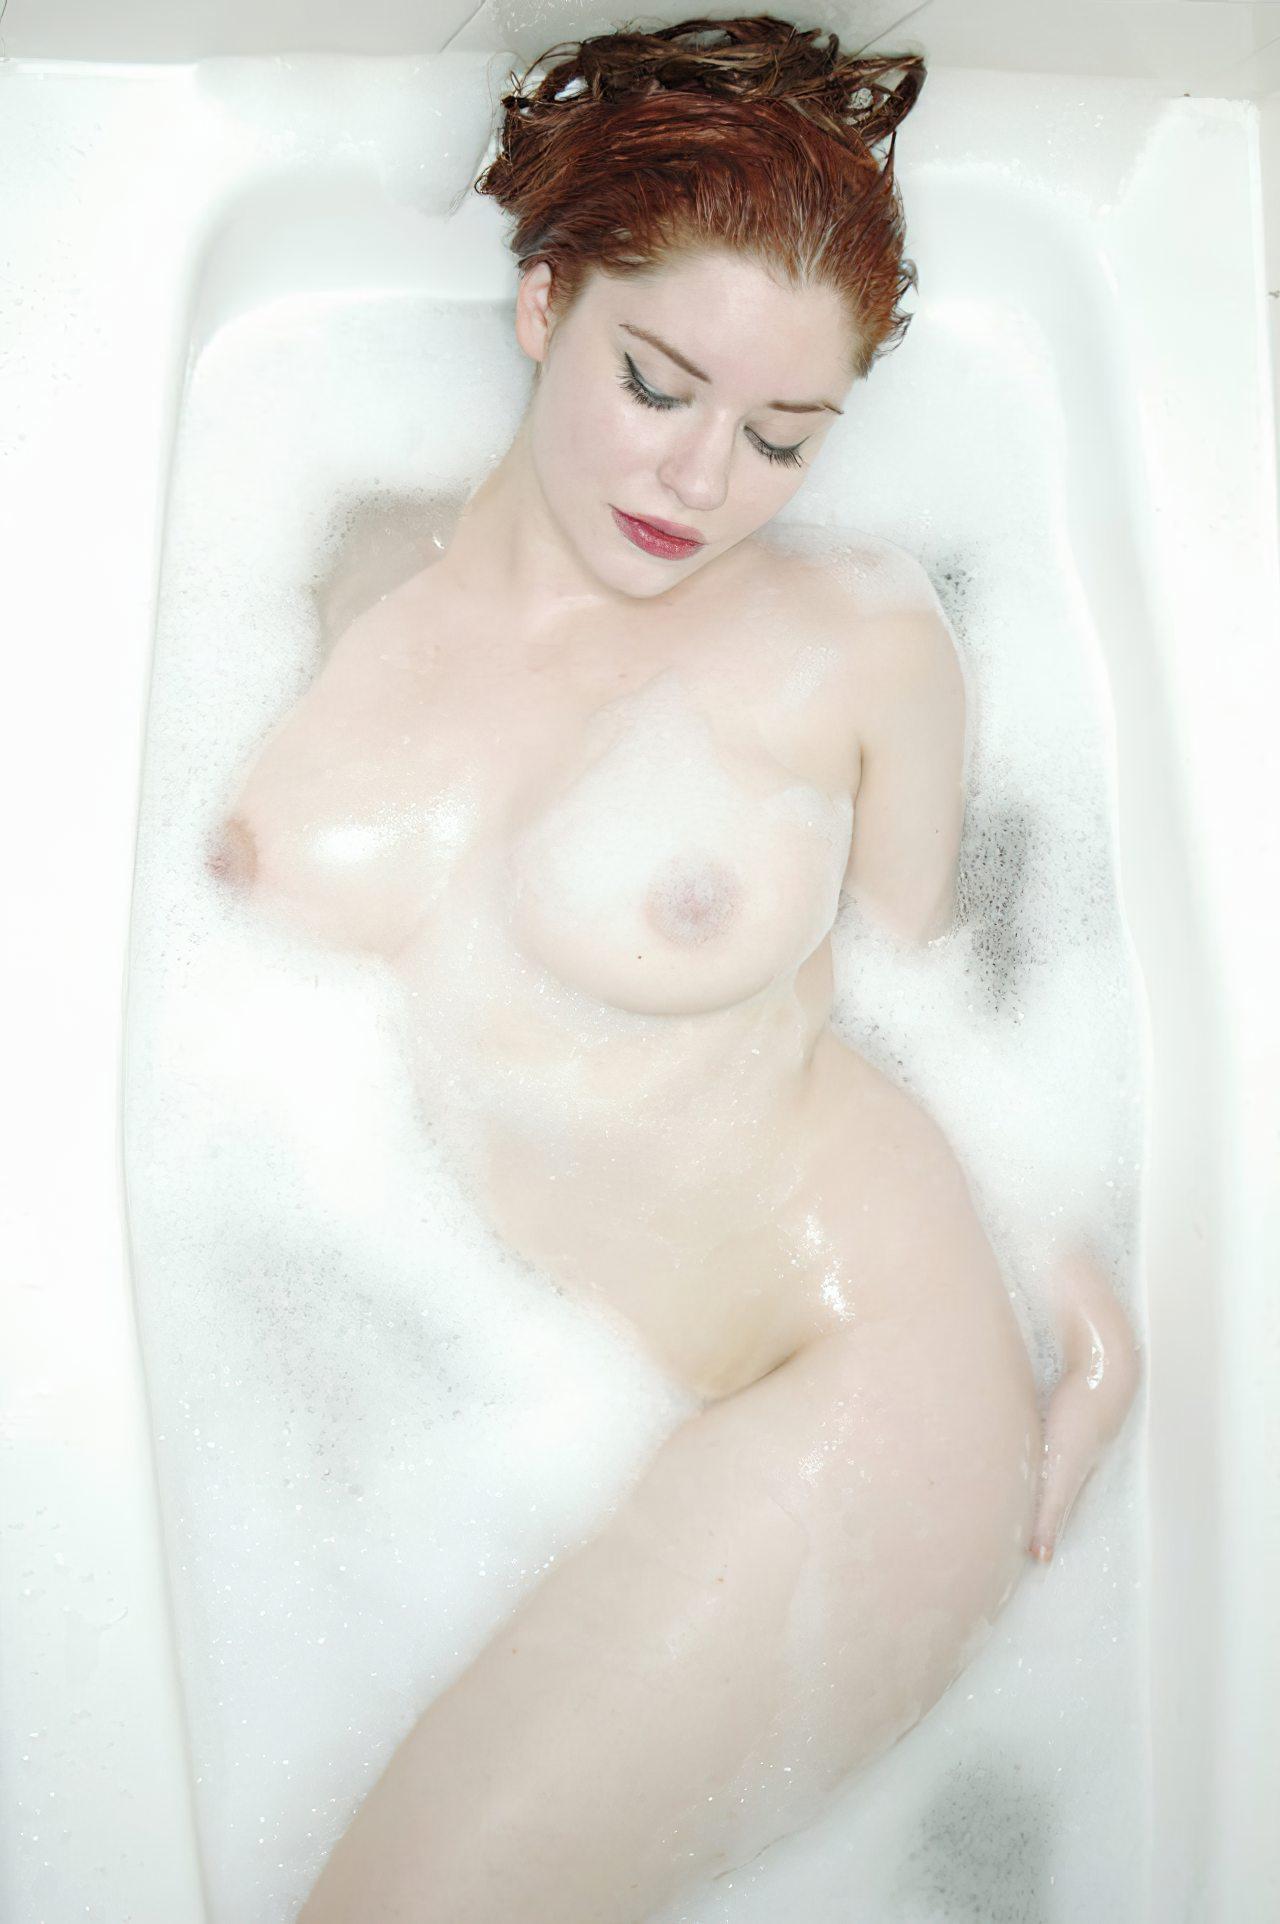 Mulheres Despidas Fotos (28)